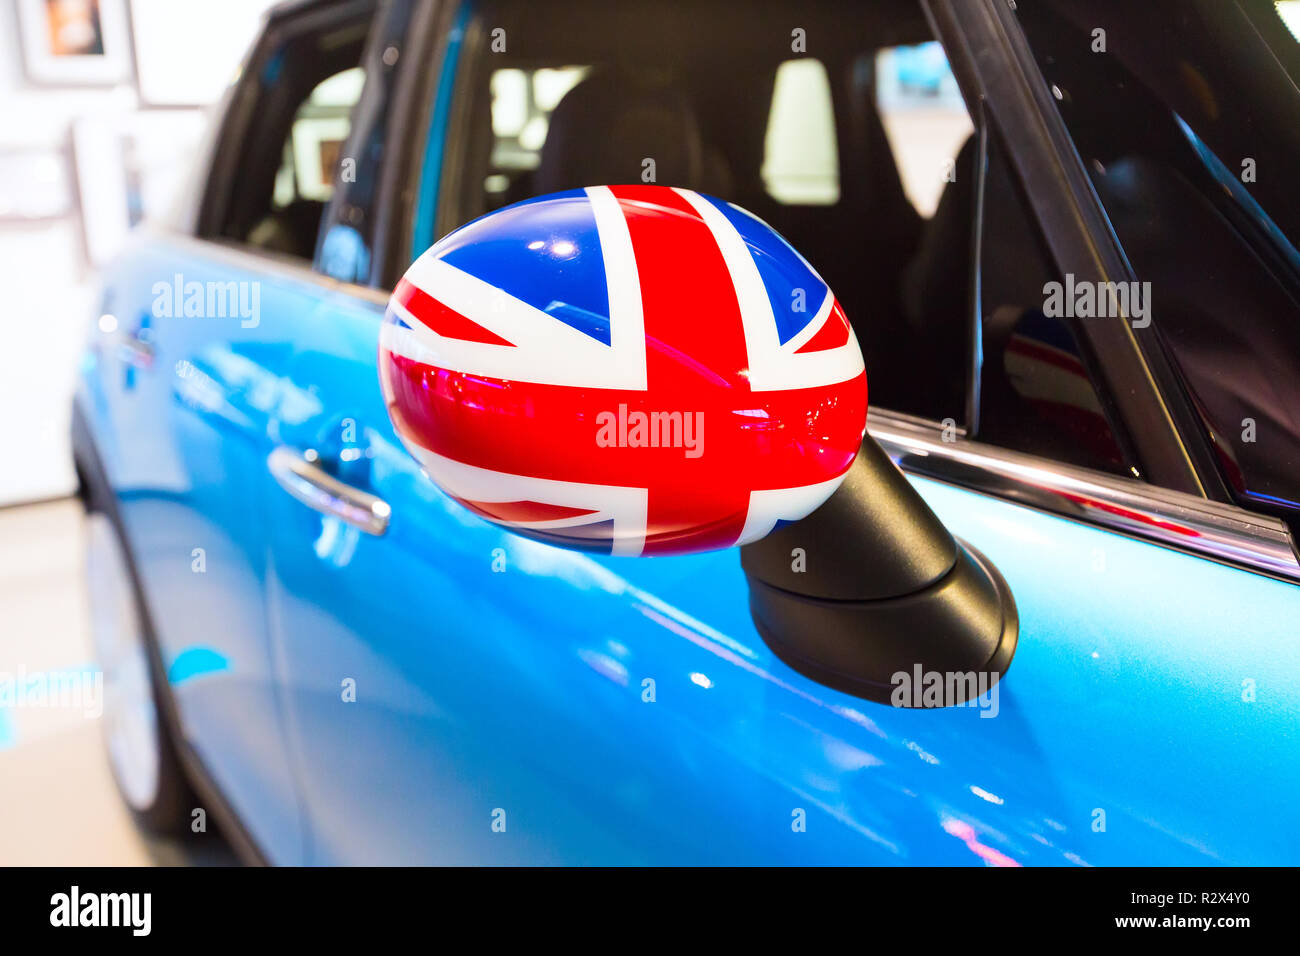 United Kingdom flag as a decoration of a car - Stock Image